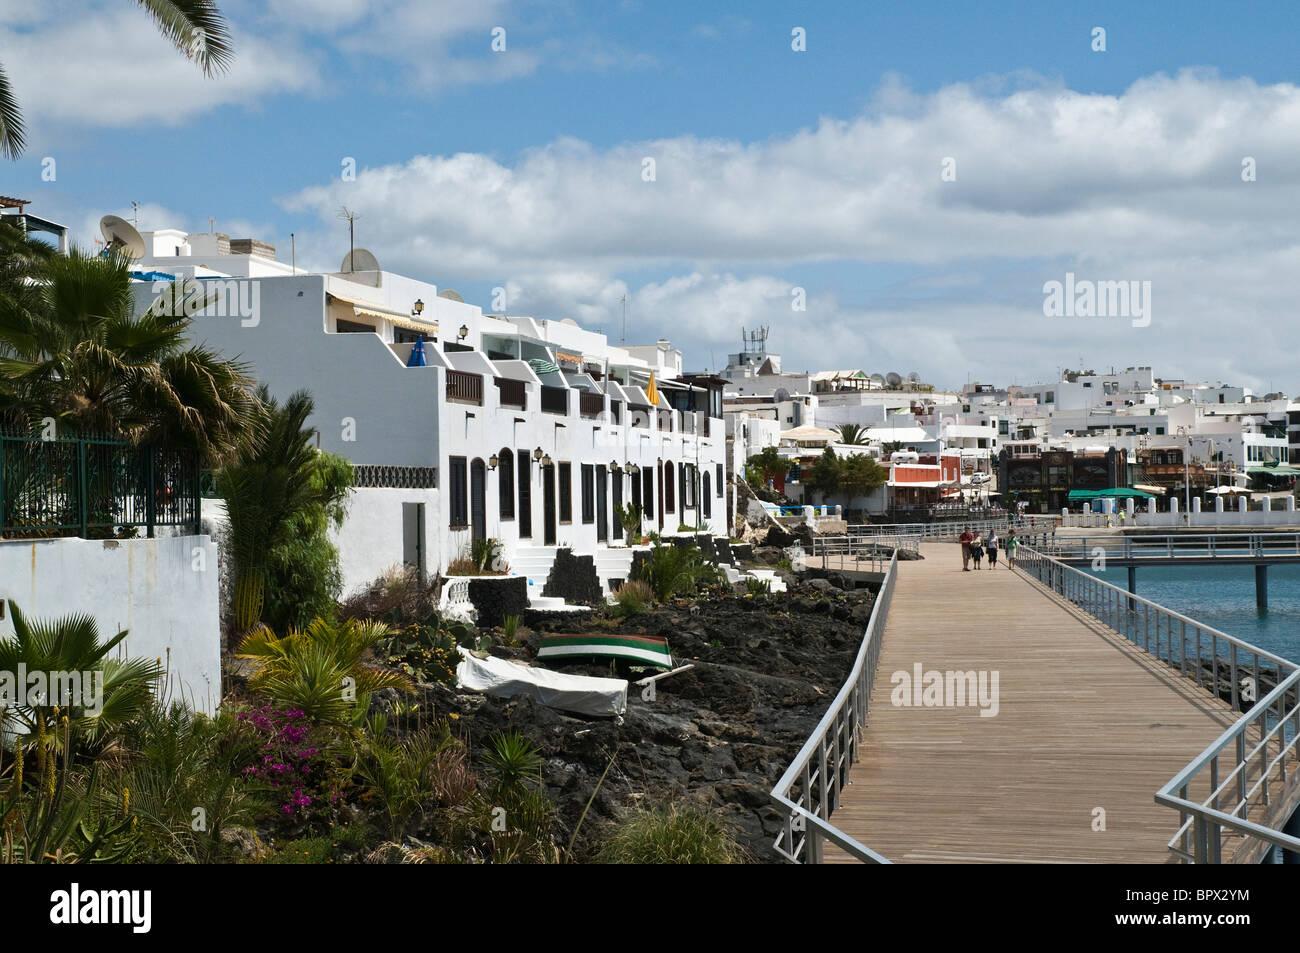 Dh puerto del carmen habour puerto del carmen lanzarote - Lanzarote walks from puerto del carmen ...